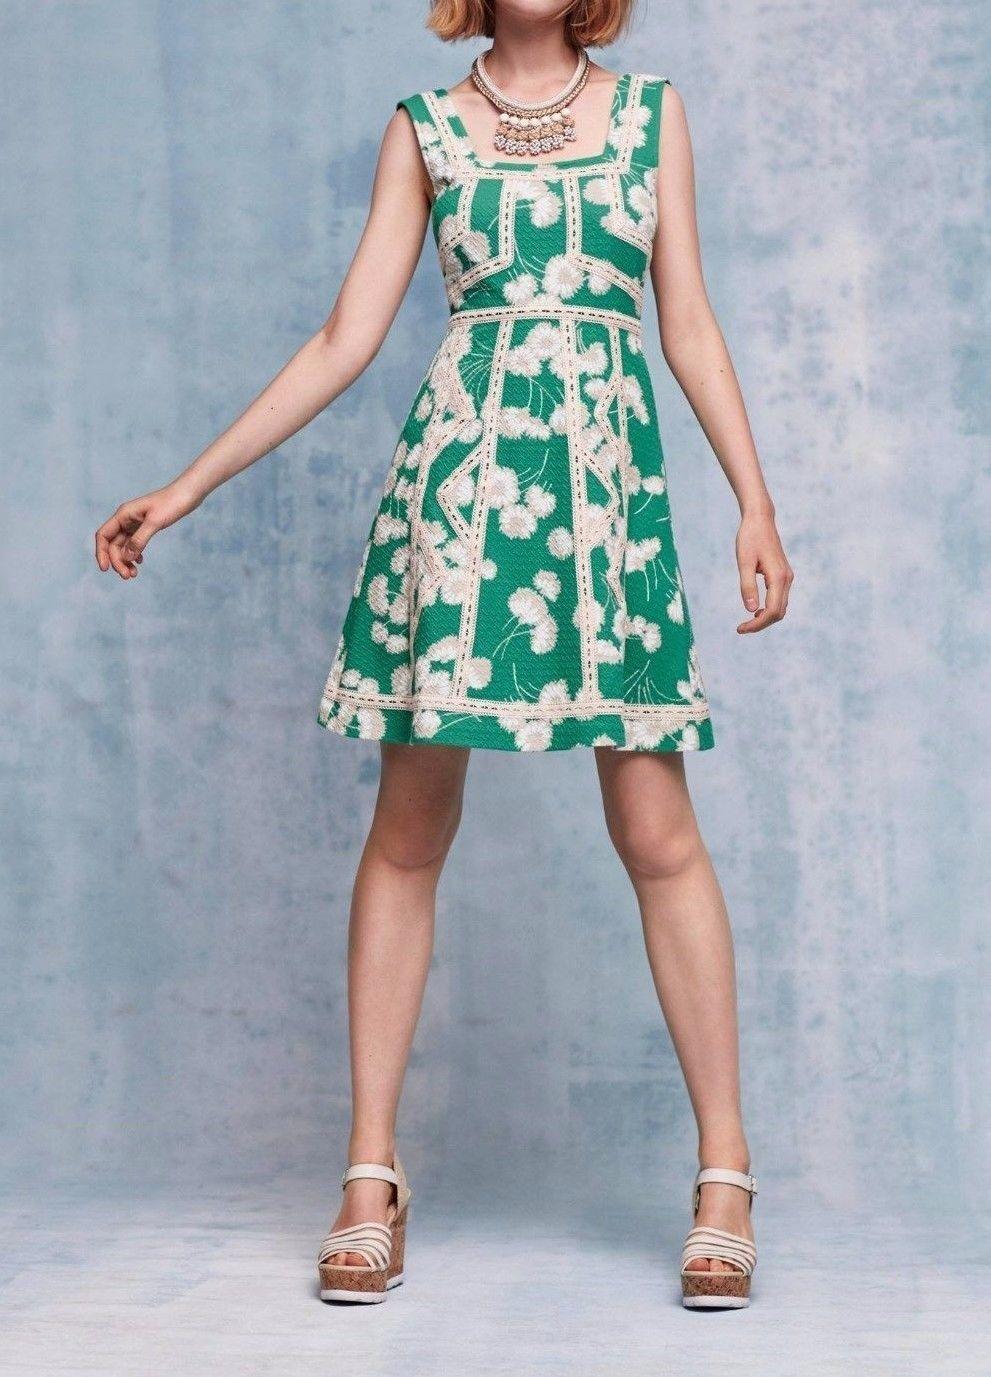 Anthropologie Emma Dress by Maeve $138 Sz 2  - NWOT